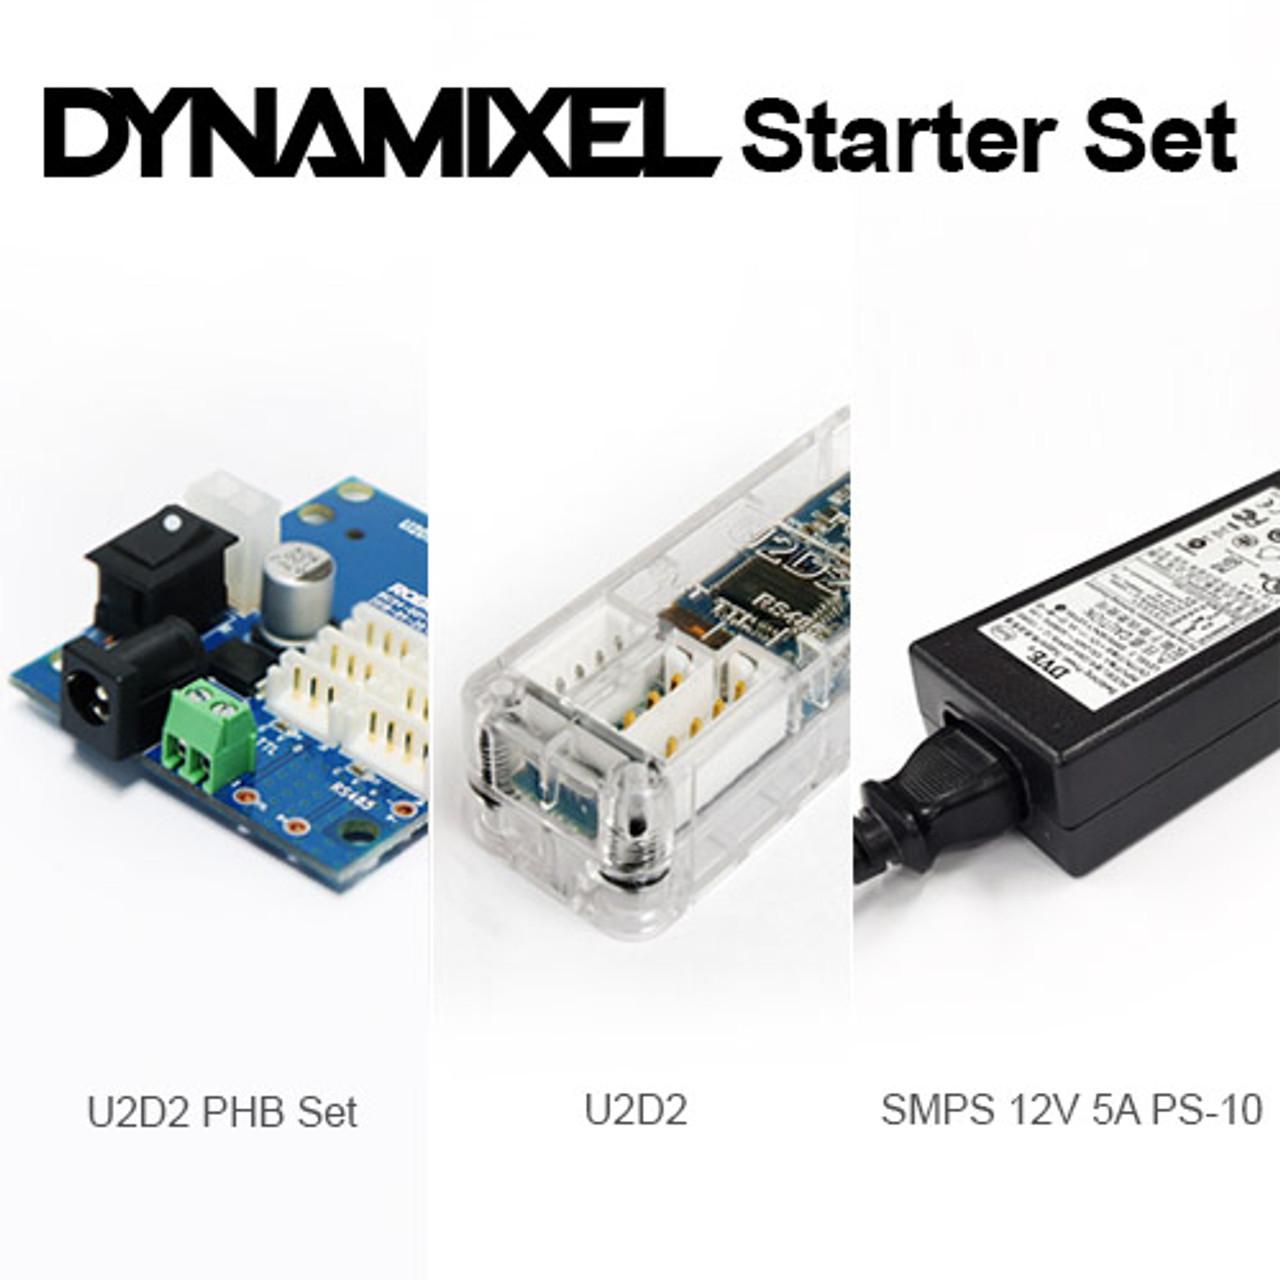 DYNAMIXEL Starter Set